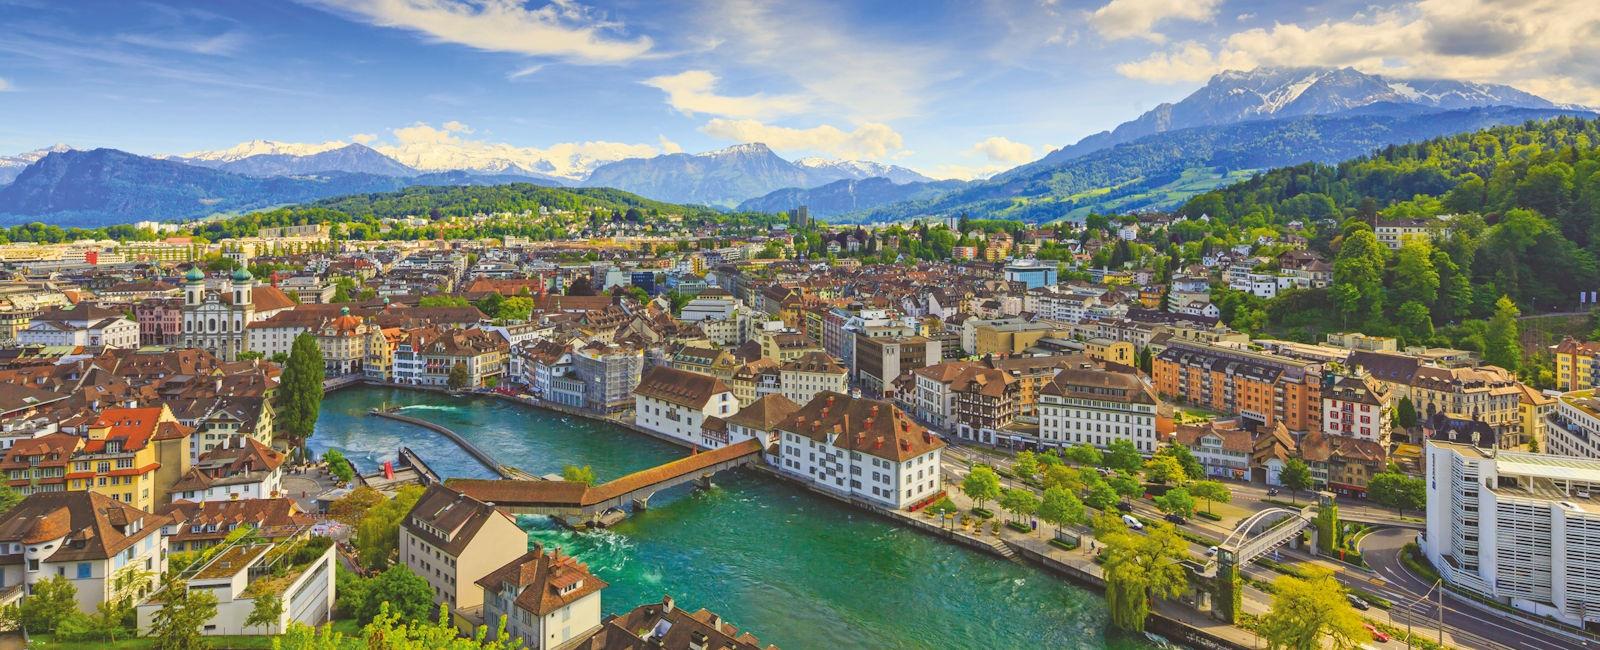 Luxury Lucerne Holidays